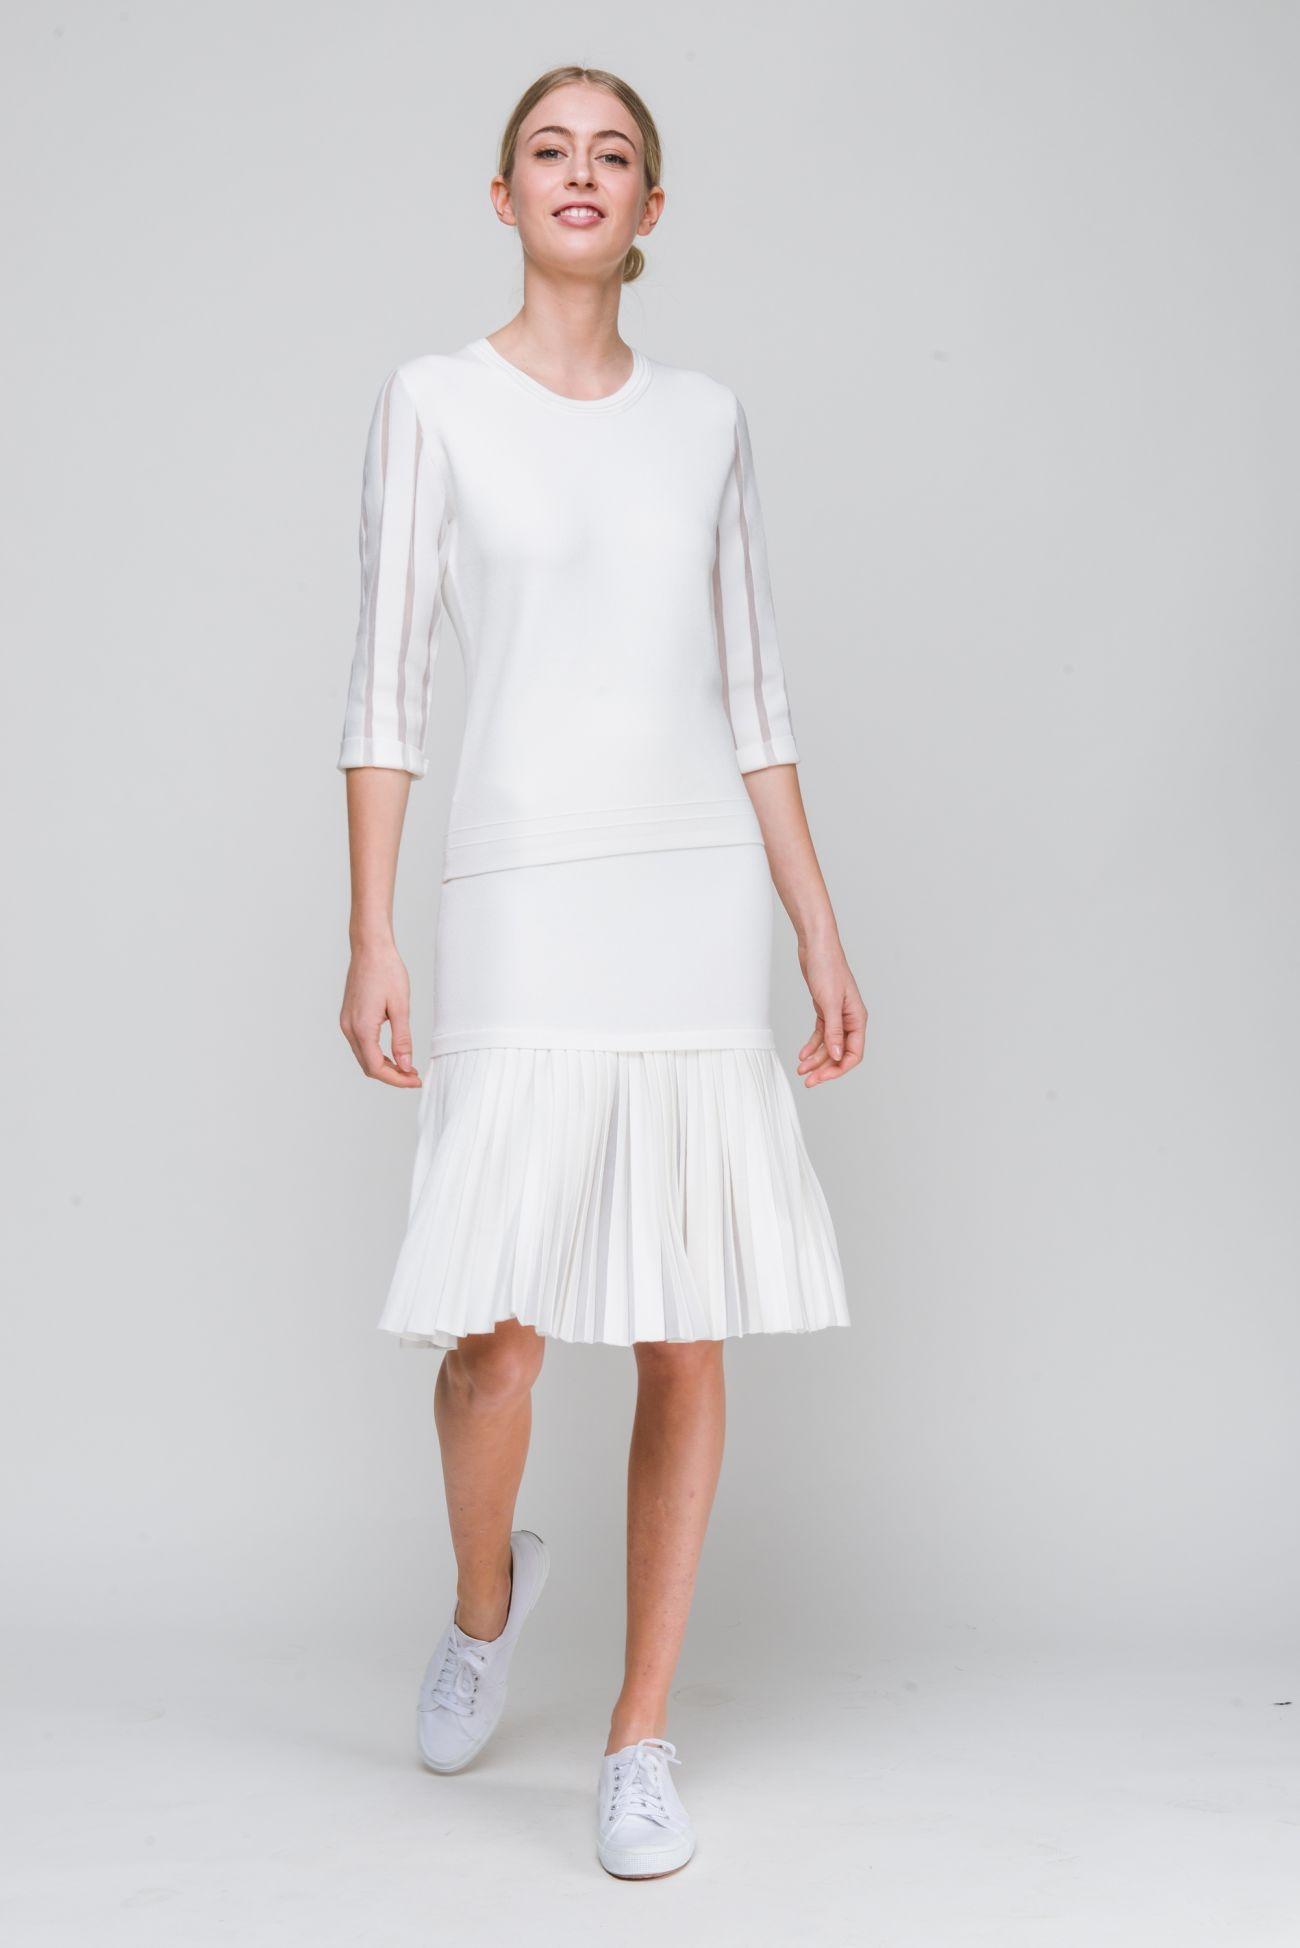 Narrow skirt with plissé